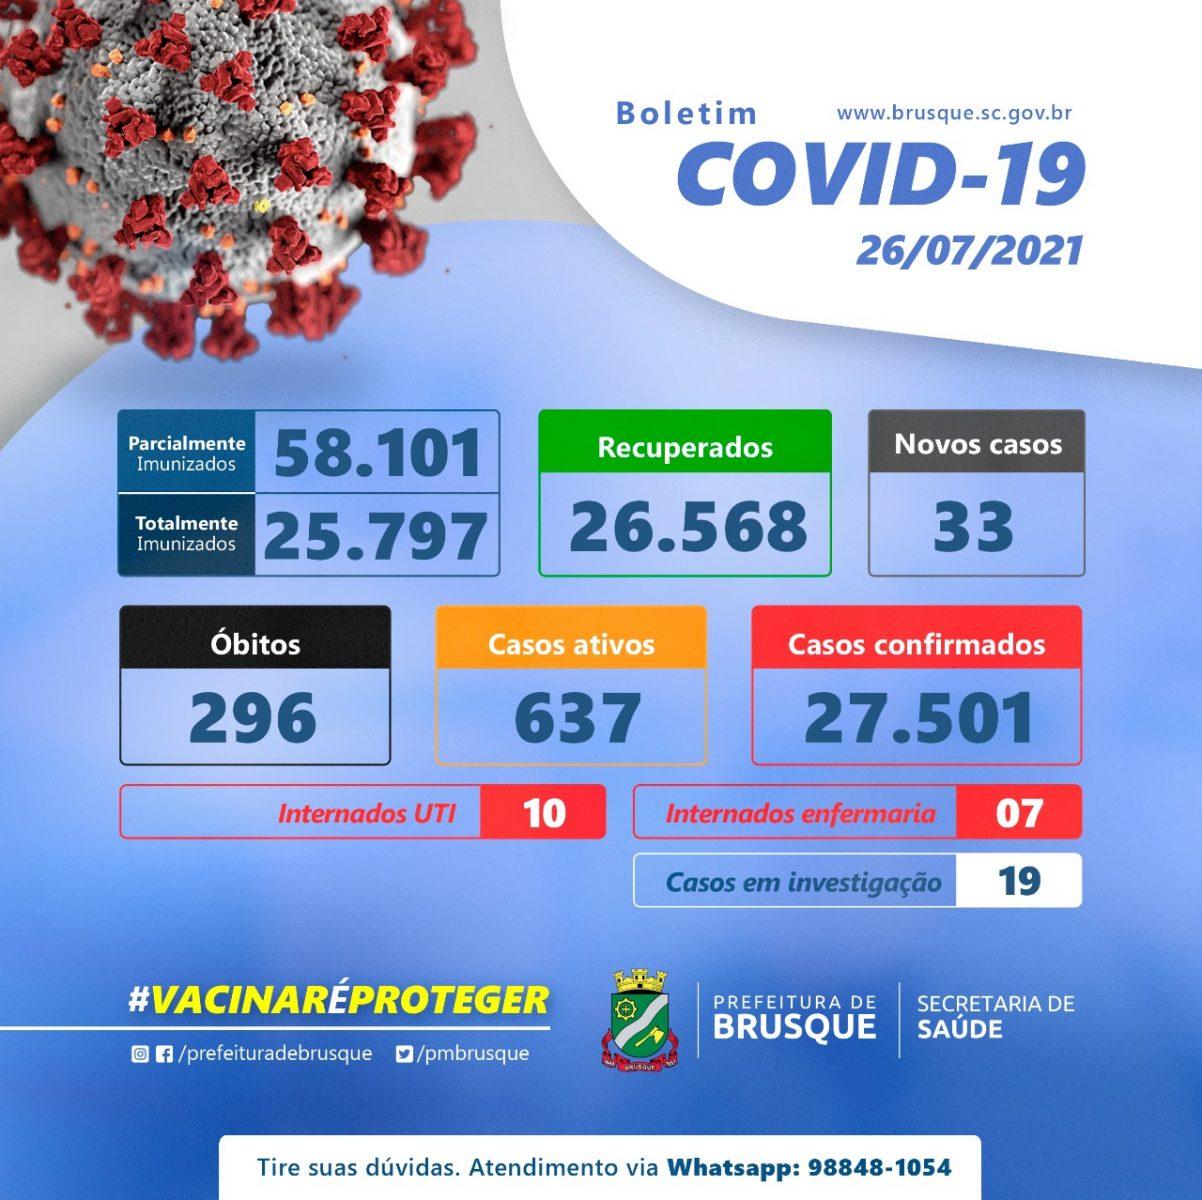 Covid-19: Confira o boletim epidemiológico desta segunda-feira (26)